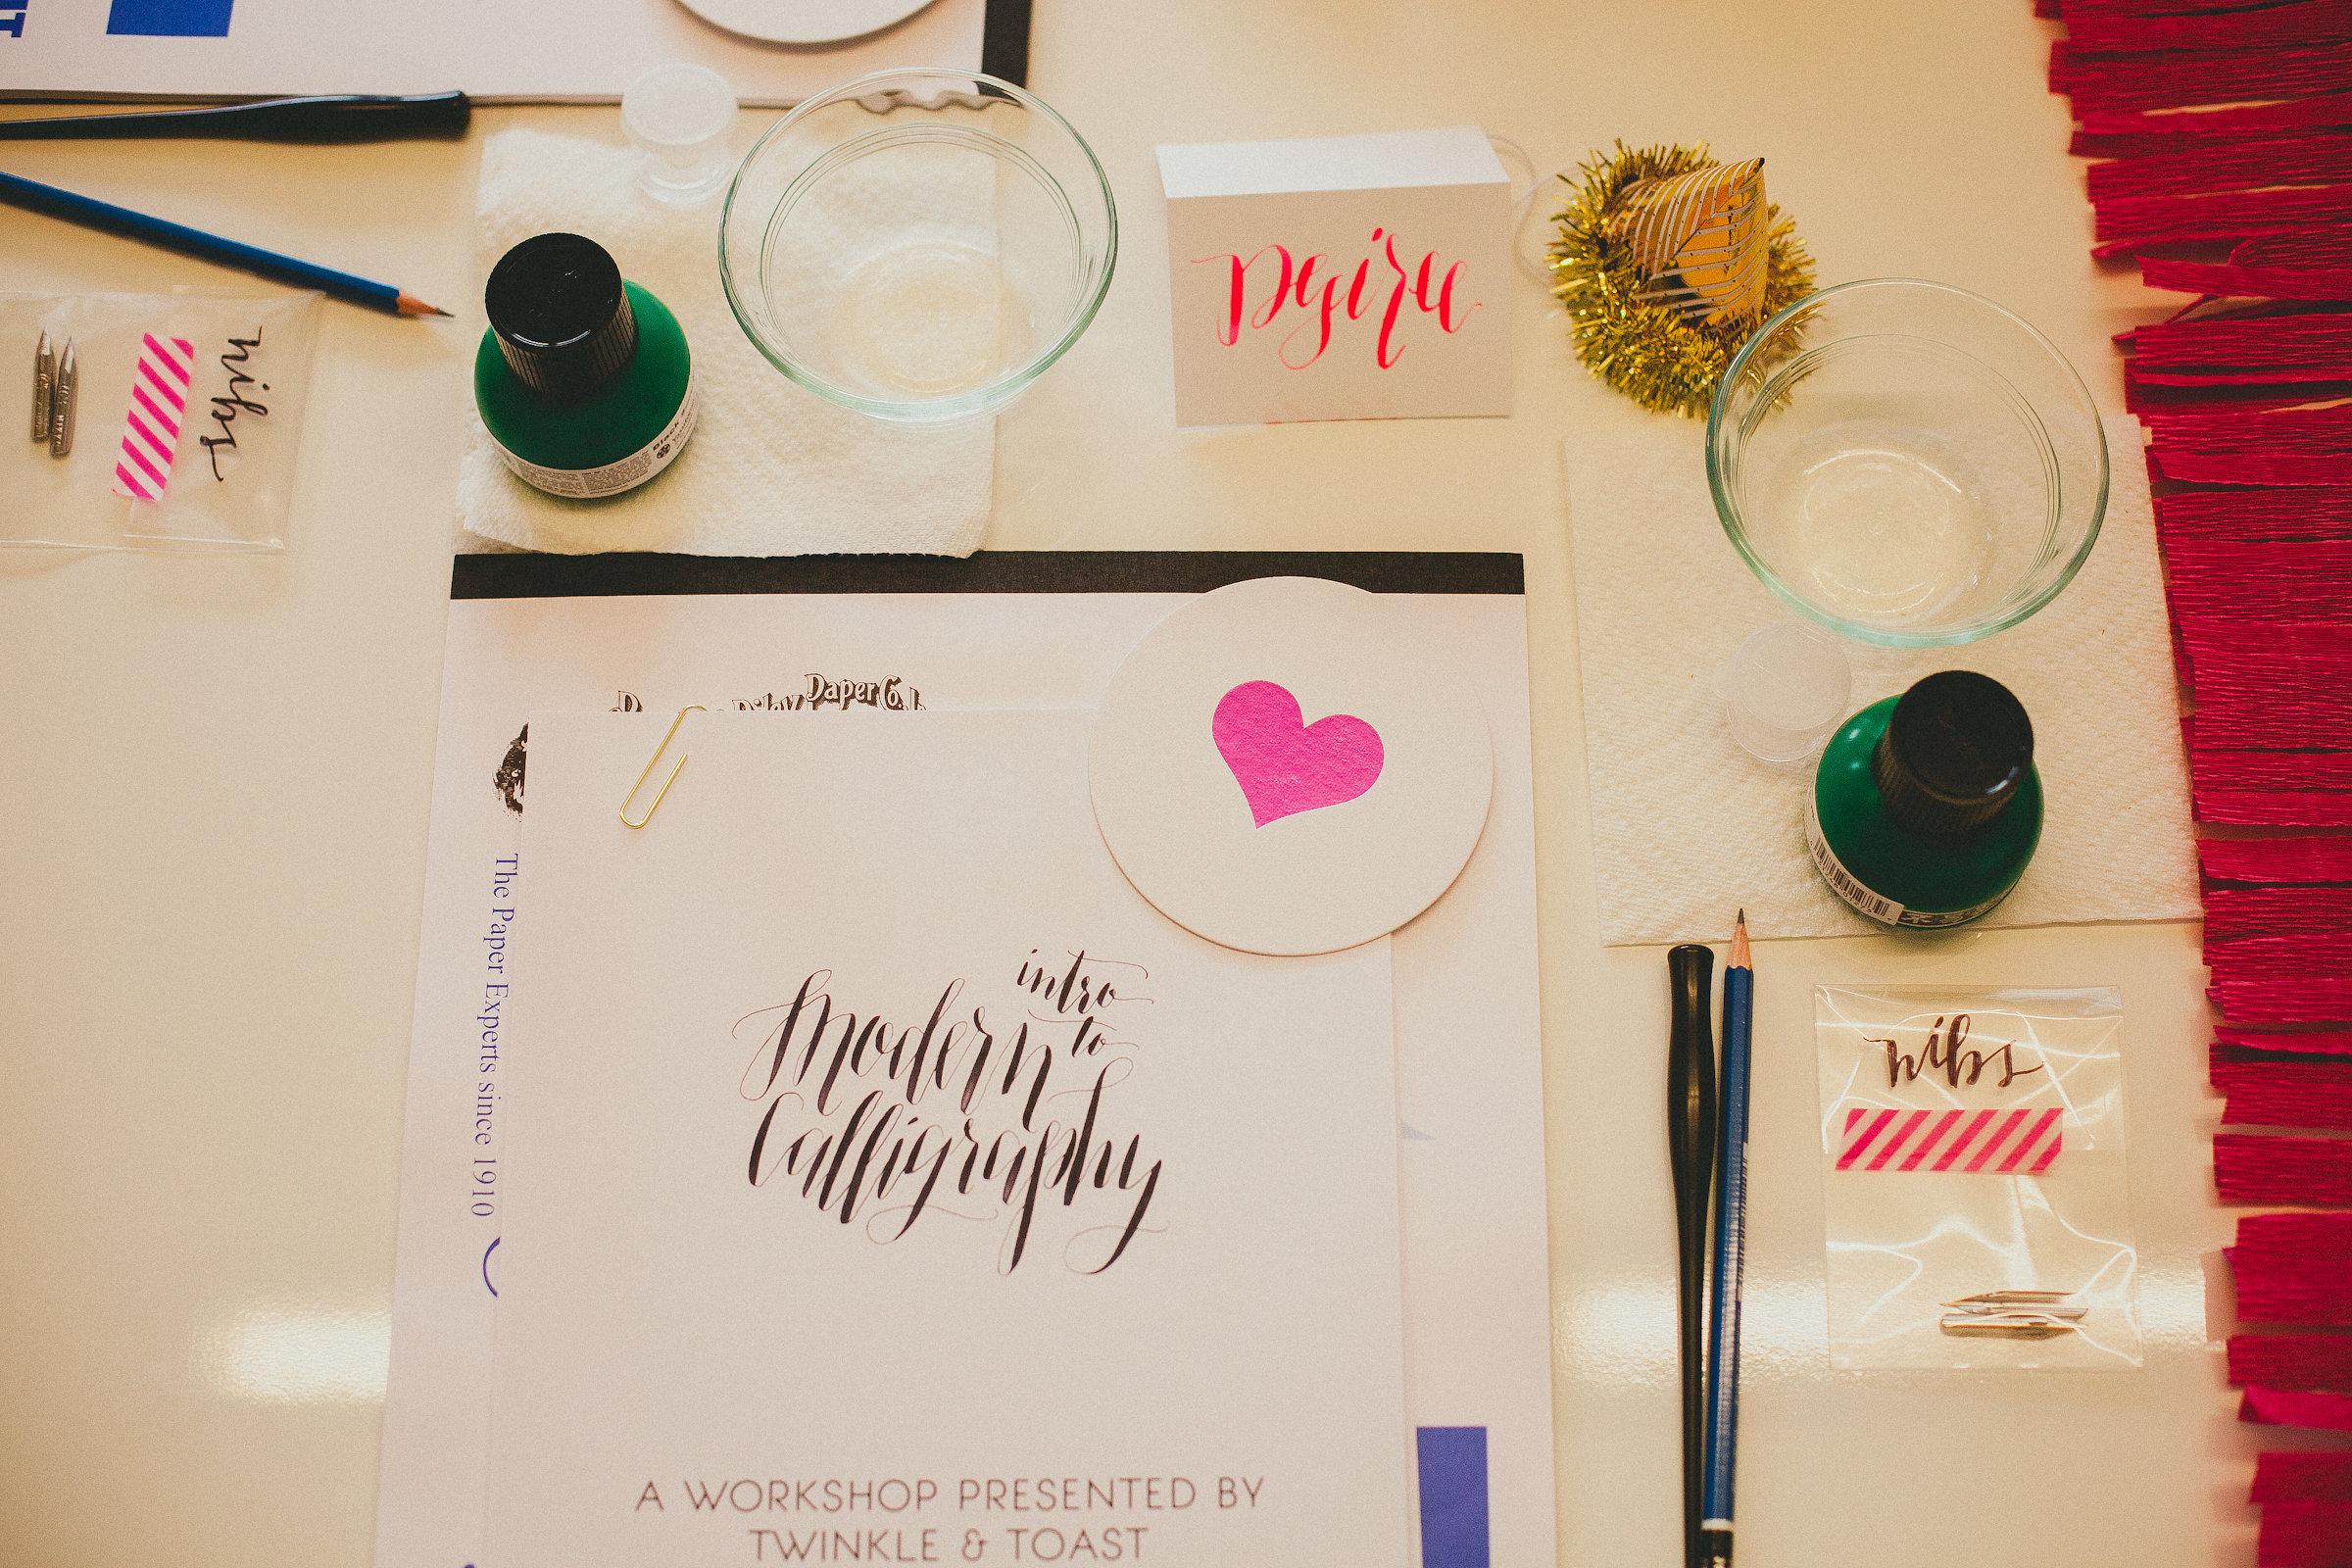 California calligraphy workshop